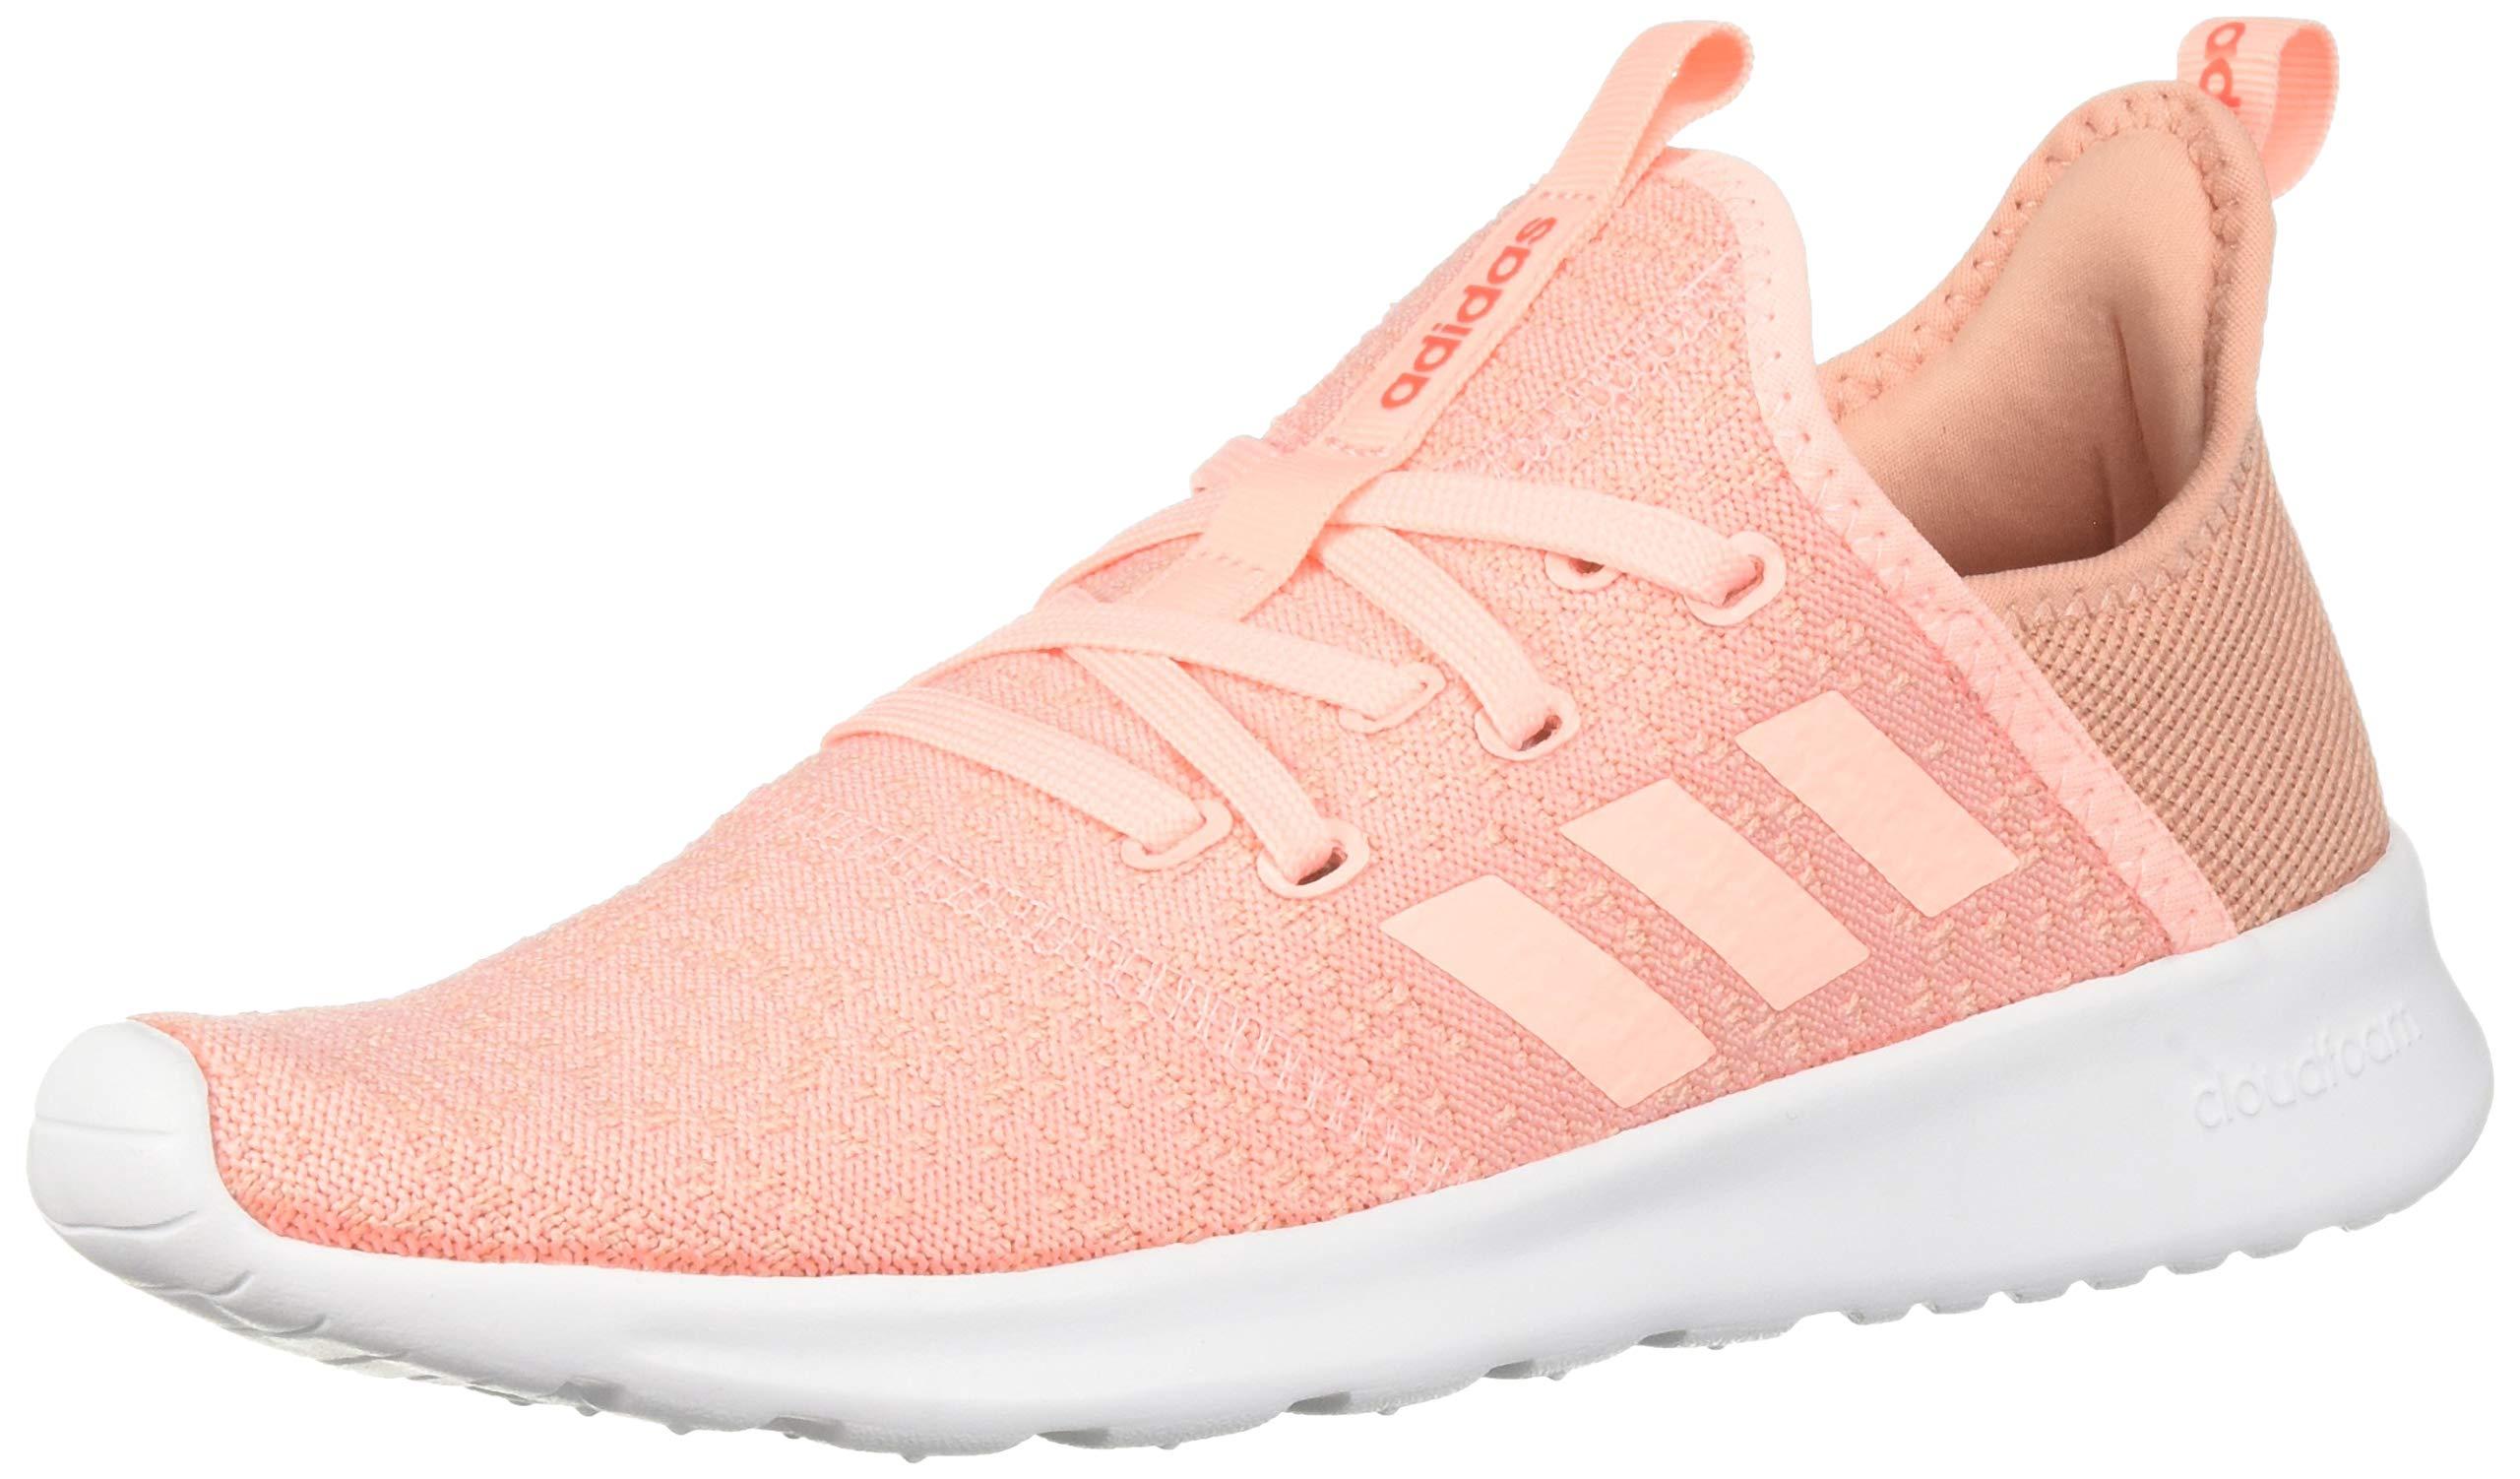 adidas Women's Cloudfoam Pure, Clear Orange/Solar red, 5 M US